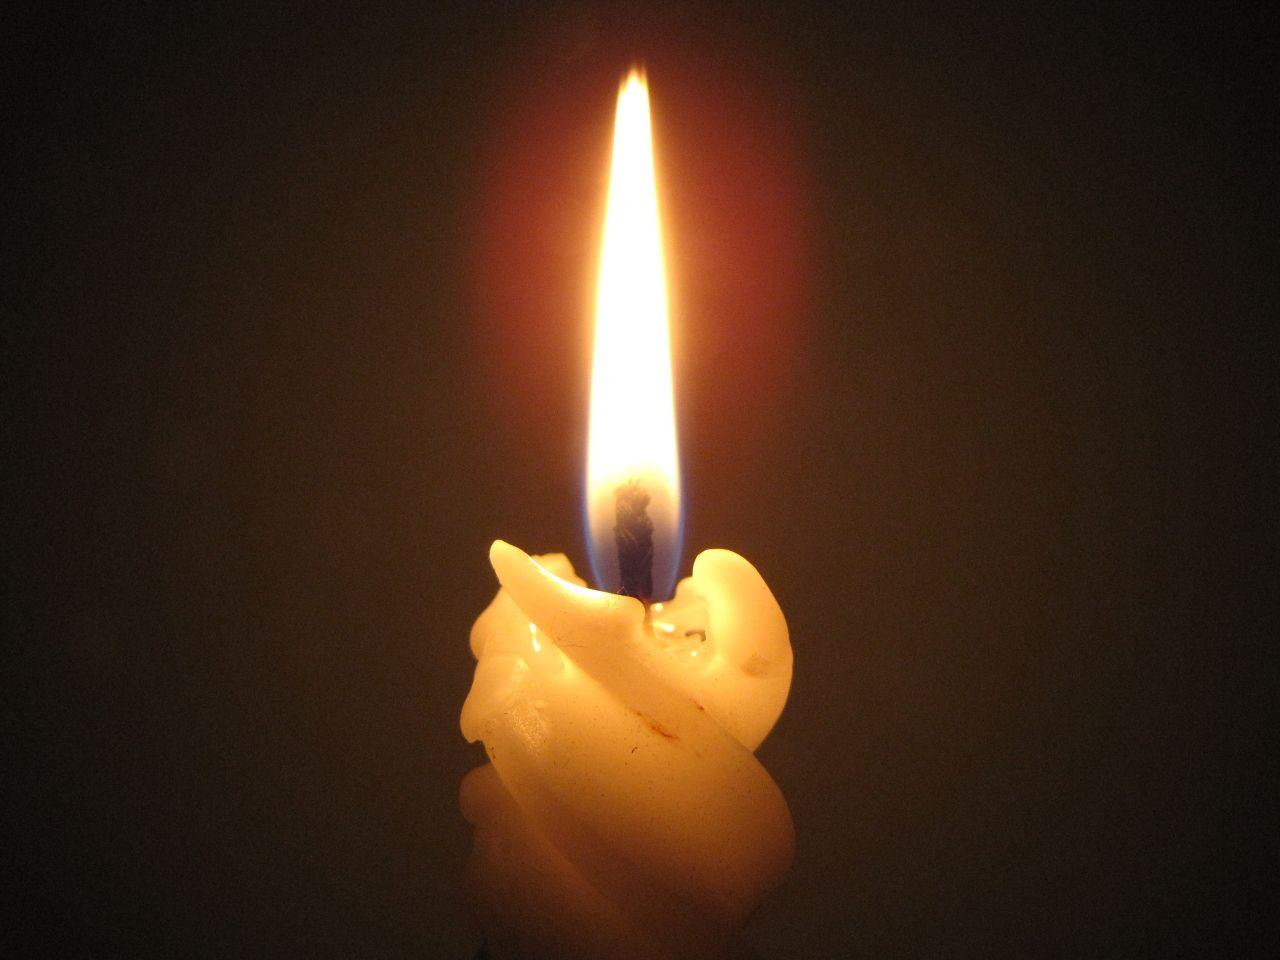 Cool burning candle desktop image for Cool candlesticks